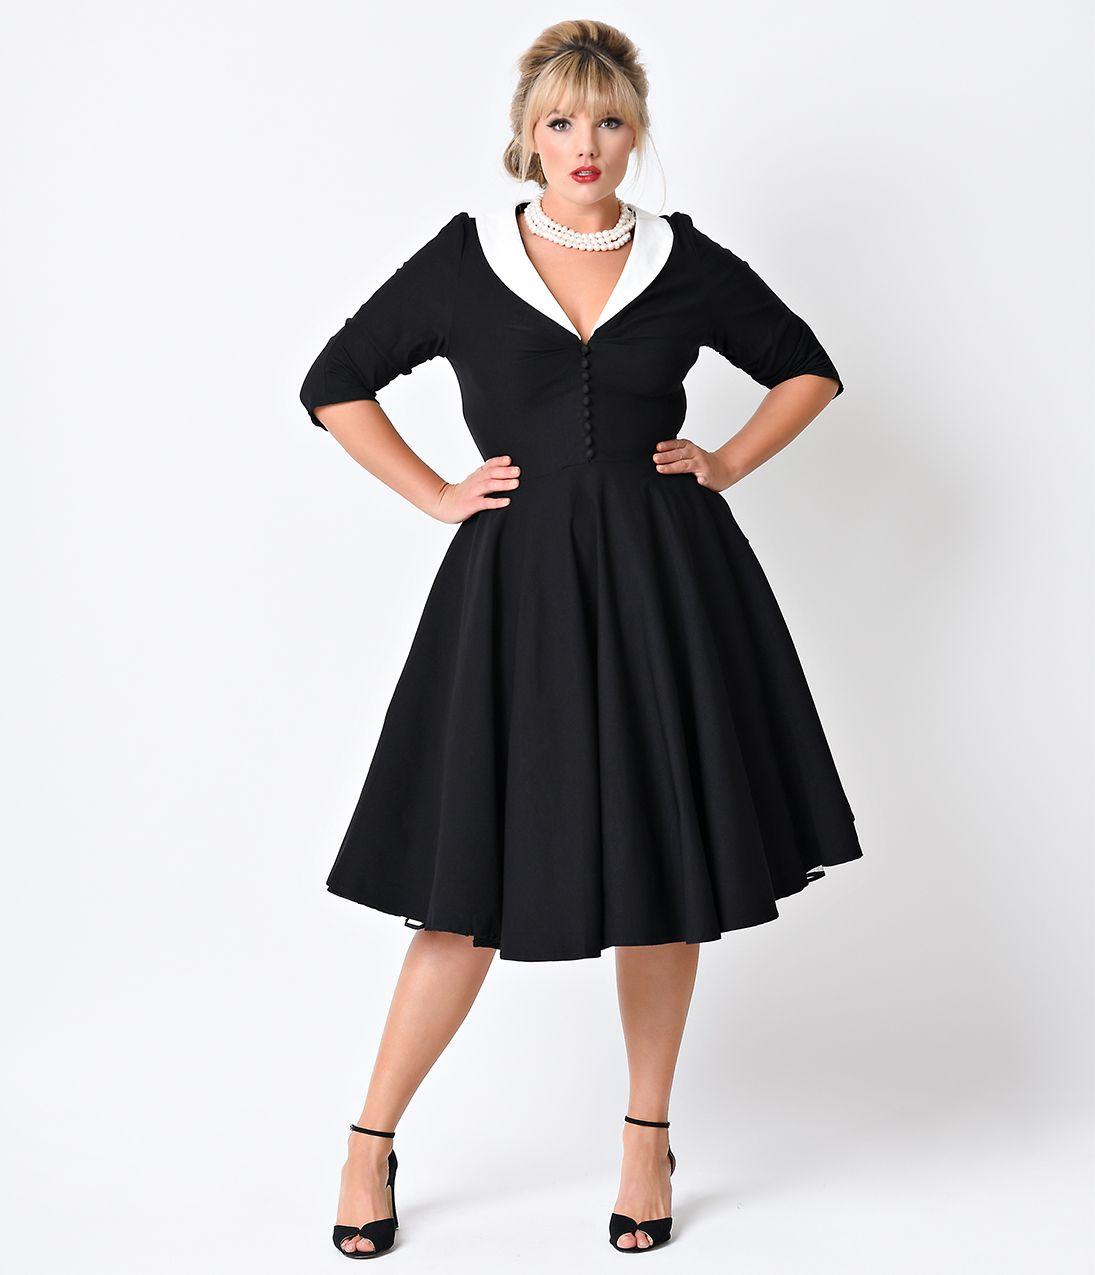 5a6b8ff3a2cd Unique Vintage Plus Size Black White Sleeved Eva Marie Dress  128.00 AT  vintagedancer.com